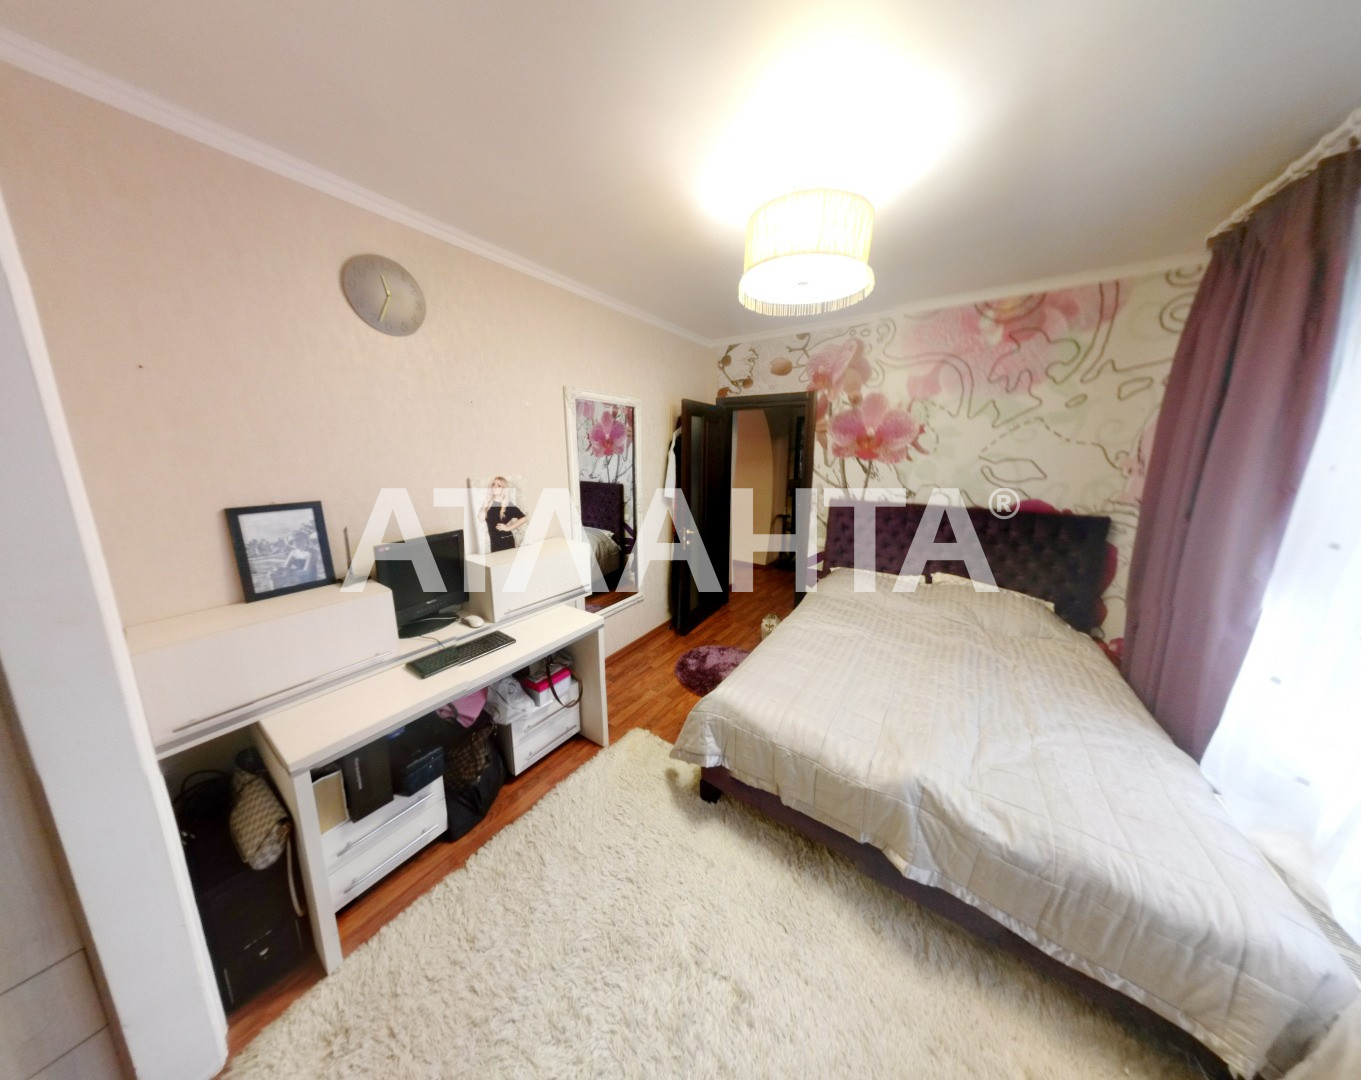 Продается 3-комнатная Квартира на ул. Ул. Ломоносова — 139 600 у.е. (фото №16)